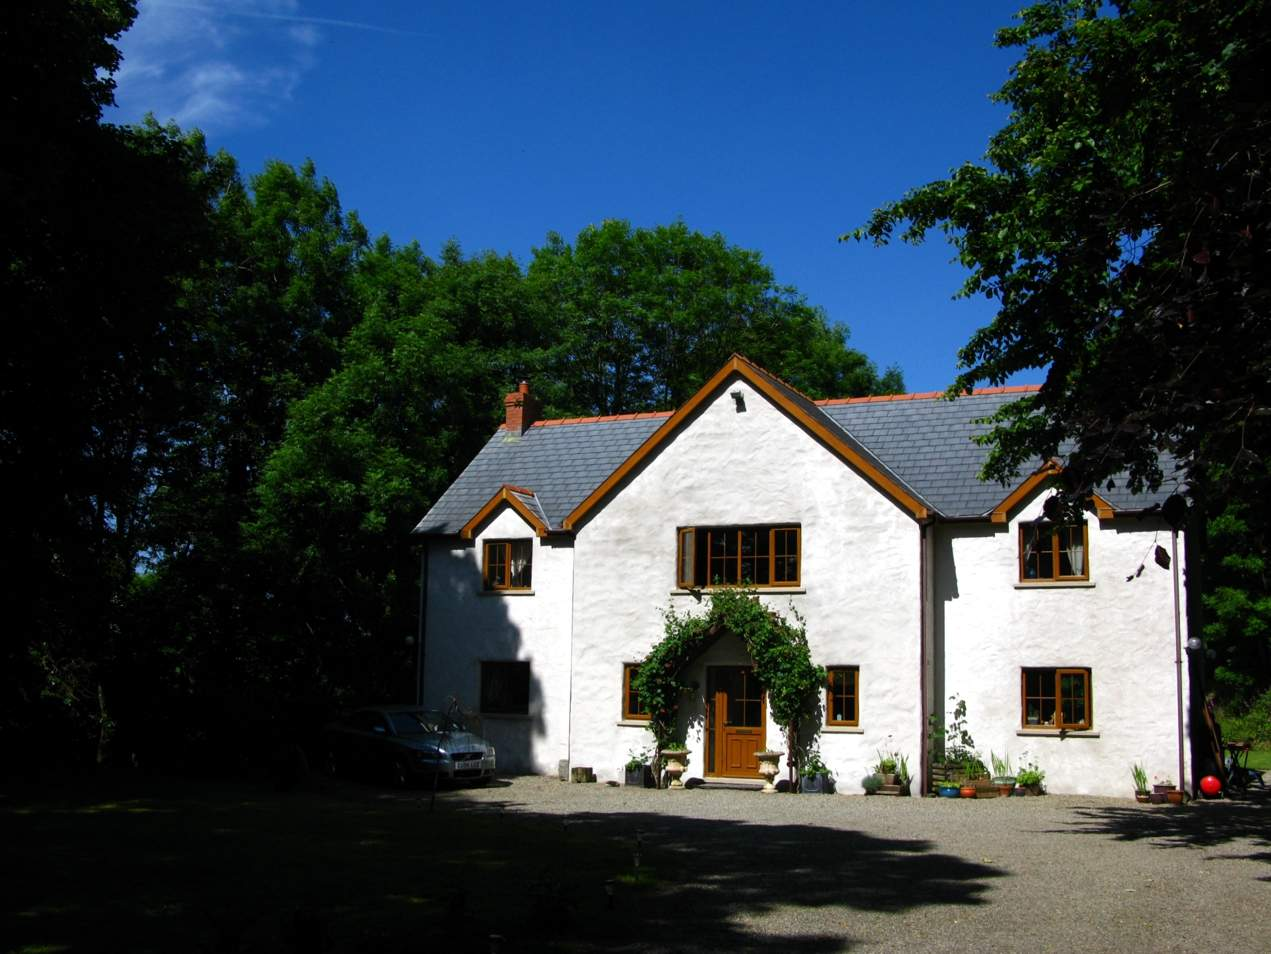 House June 2014